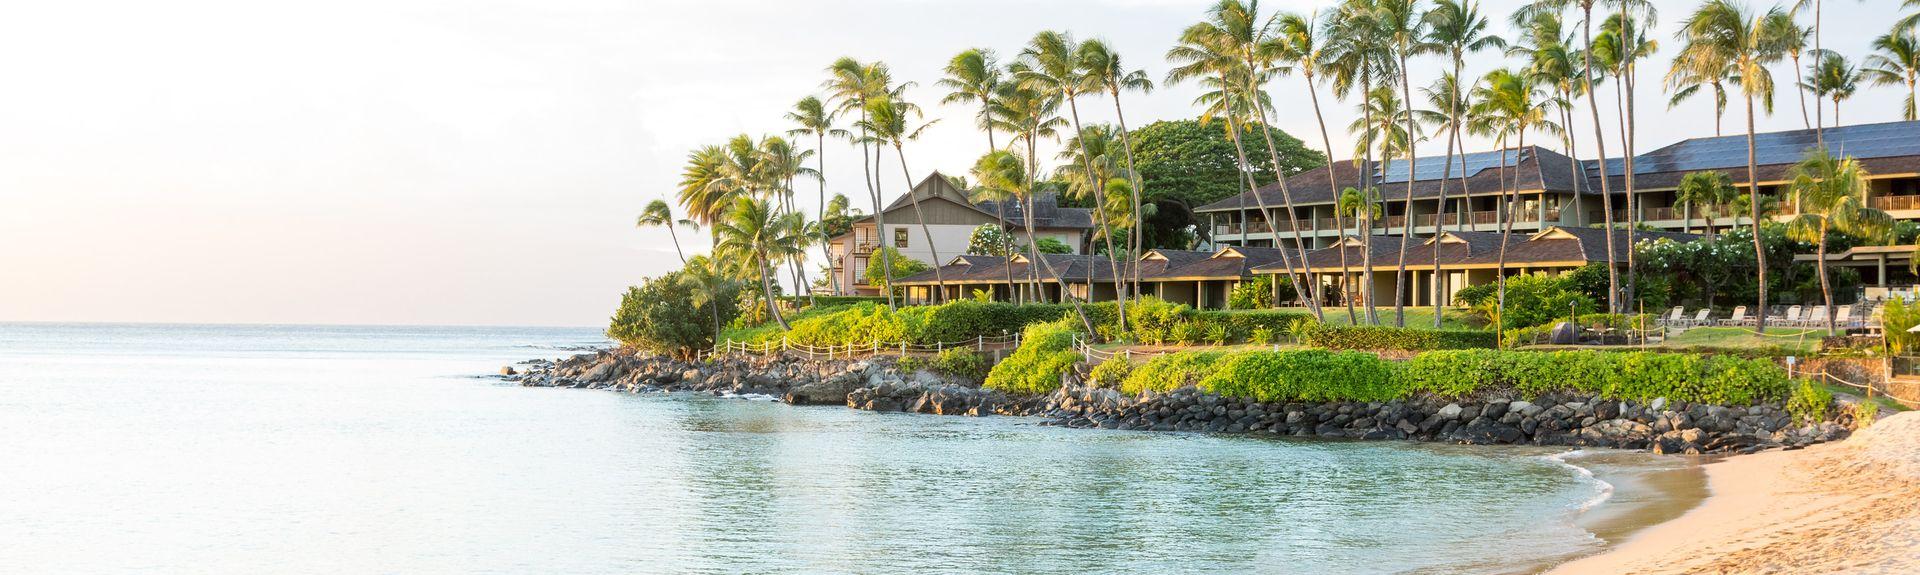 Napili Shores Maui, Lahaina, HI, USA (Napili, Hawaï, États-Unis d'Amérique)